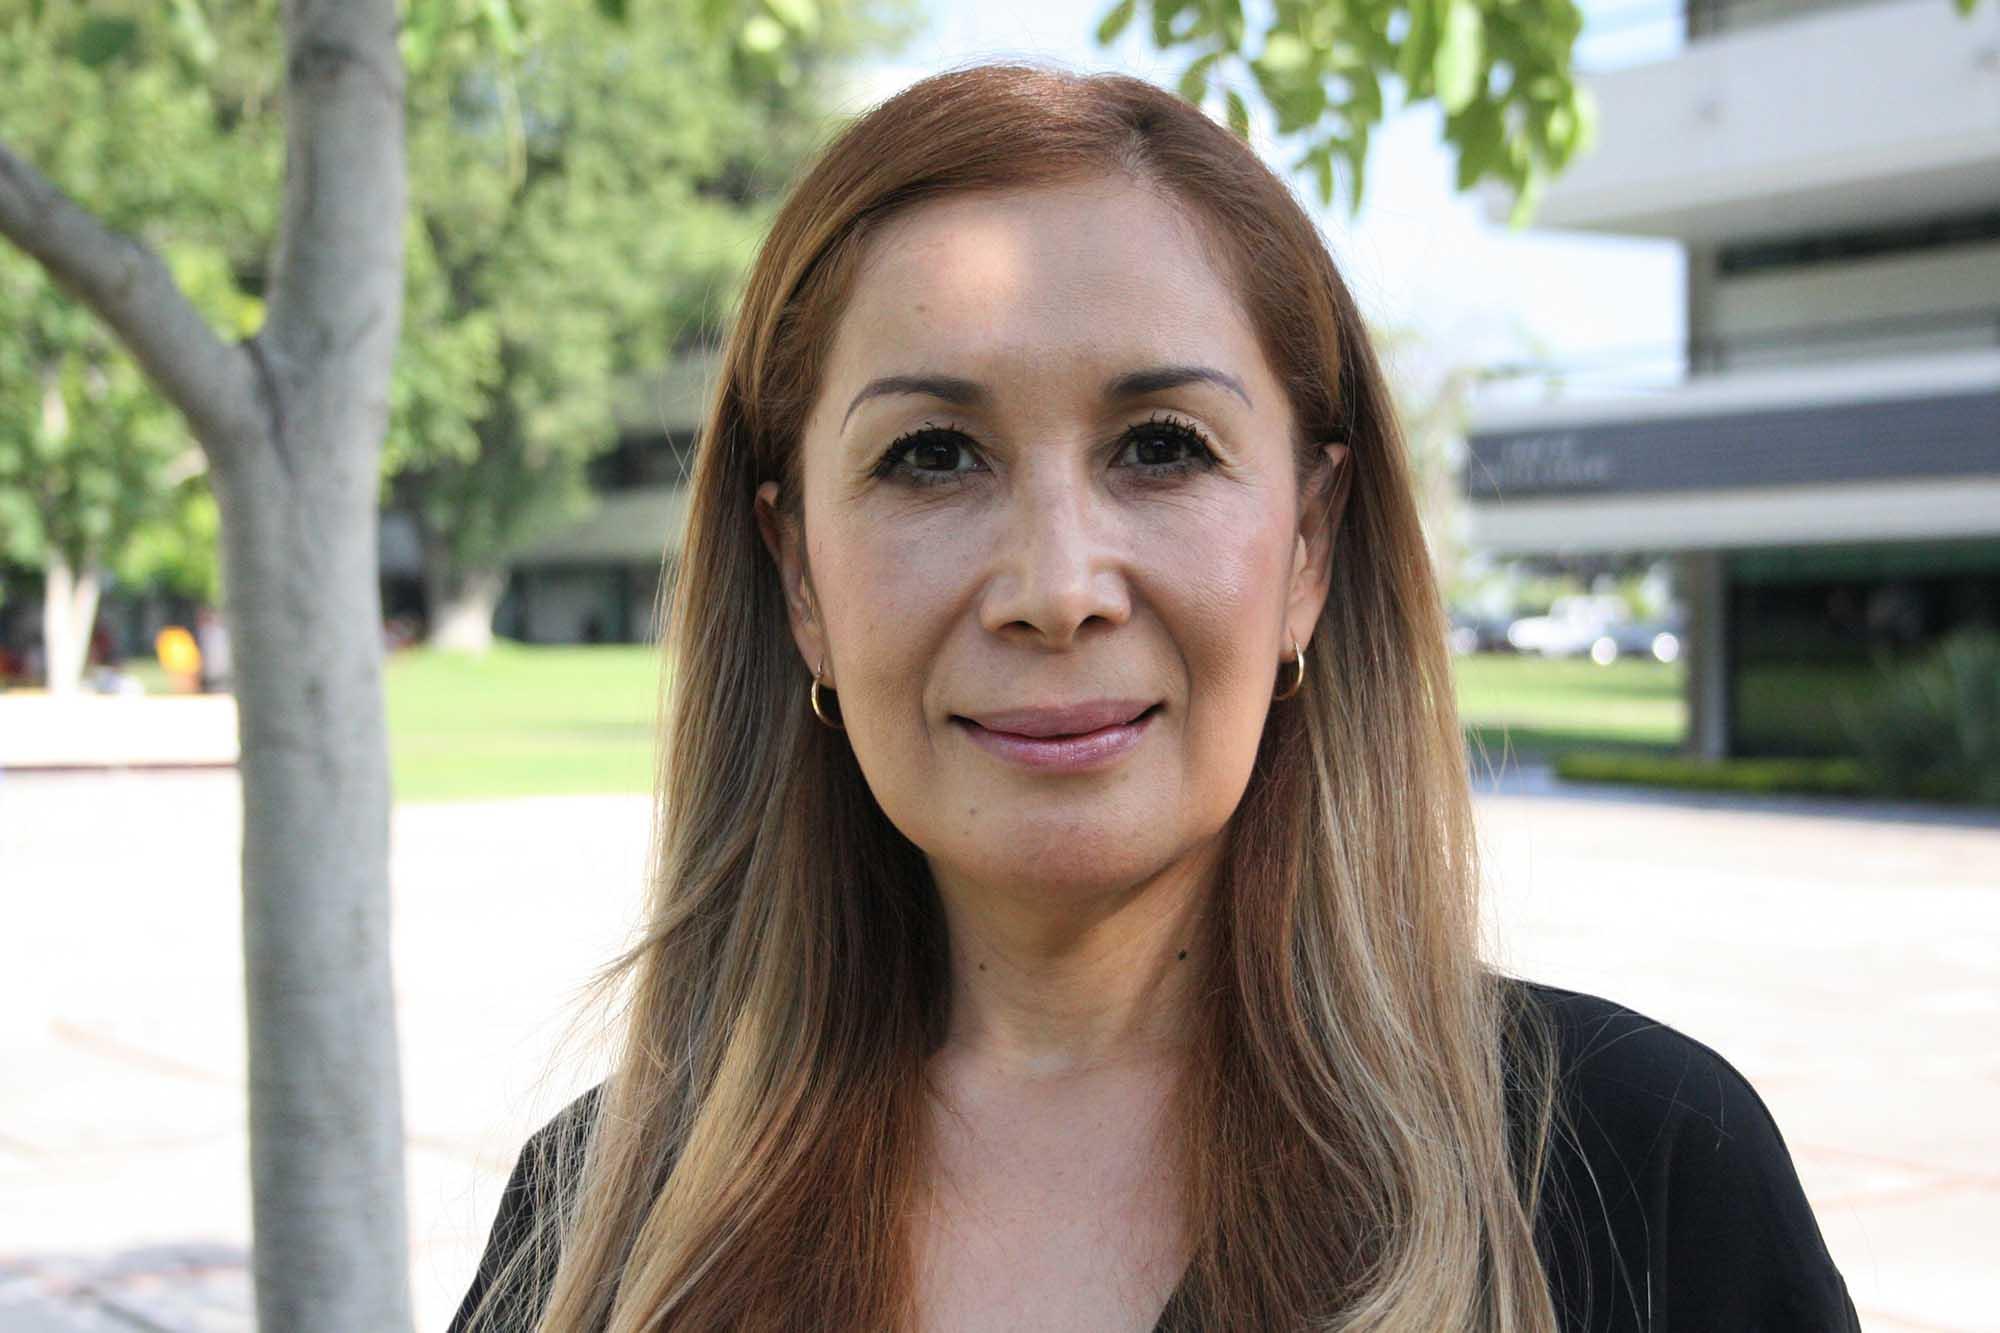 Entrevista Claudia Arias 231019